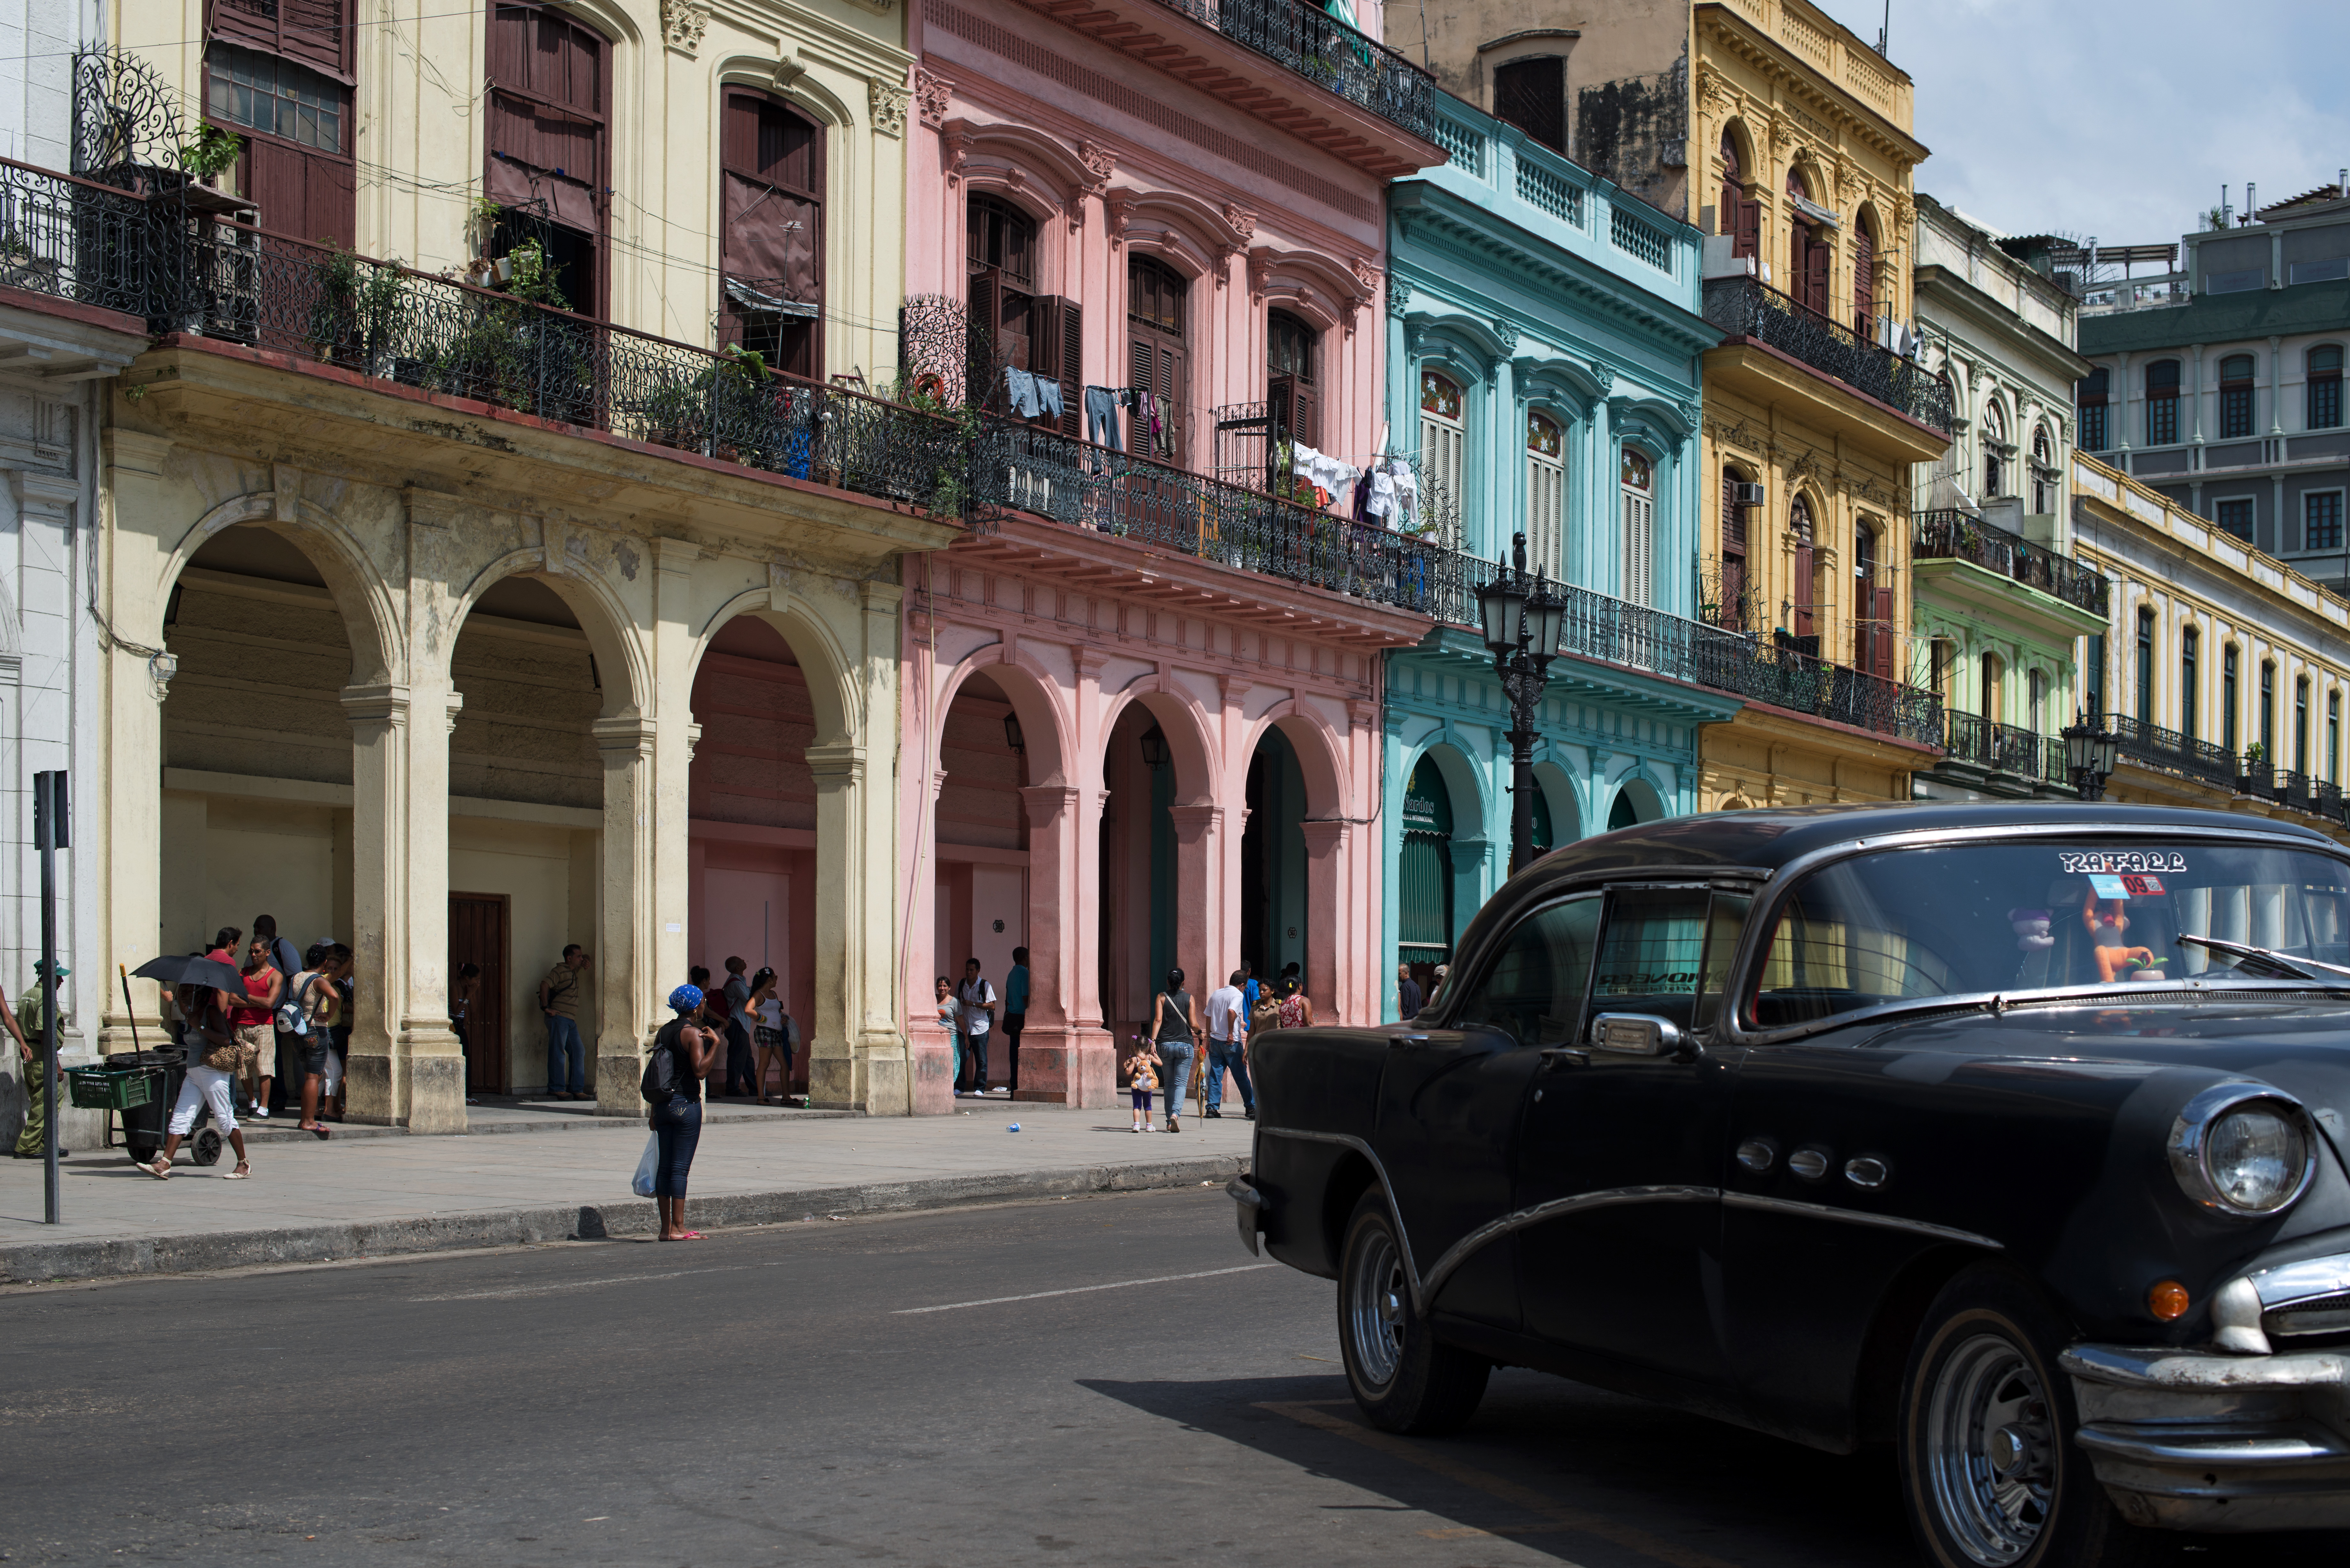 Habana_gadeview_2_2808Habana_gadeview_2low